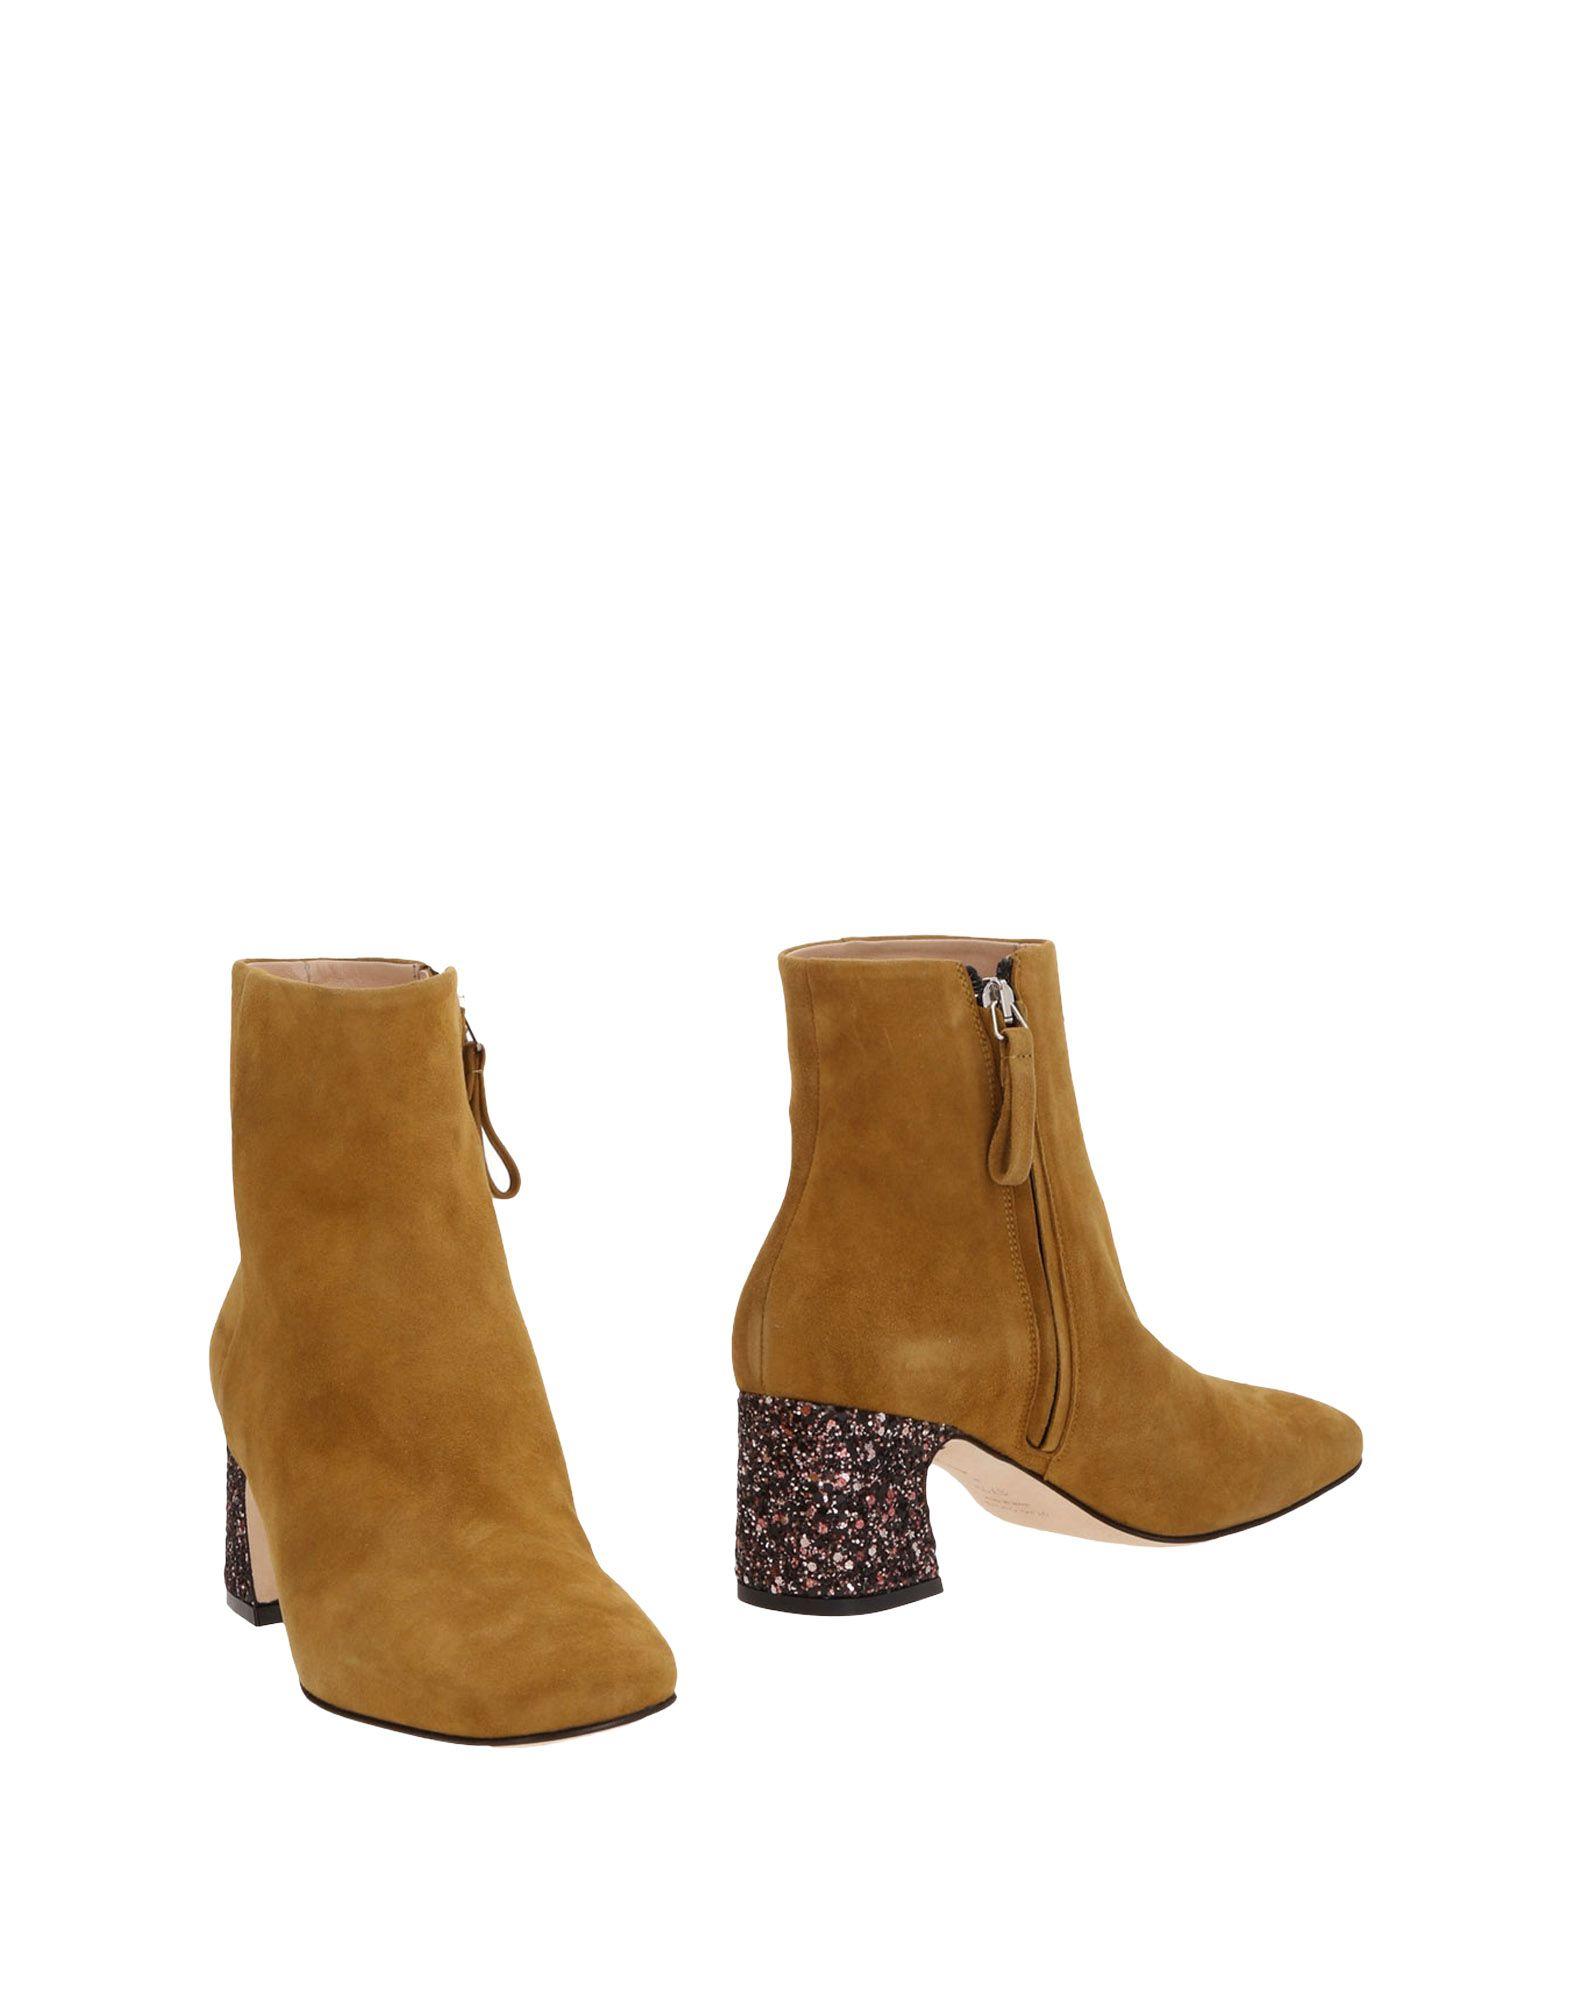 Benedetta Damen Boroli Stiefelette Damen Benedetta  11463507KQ Beliebte Schuhe 8fa26f